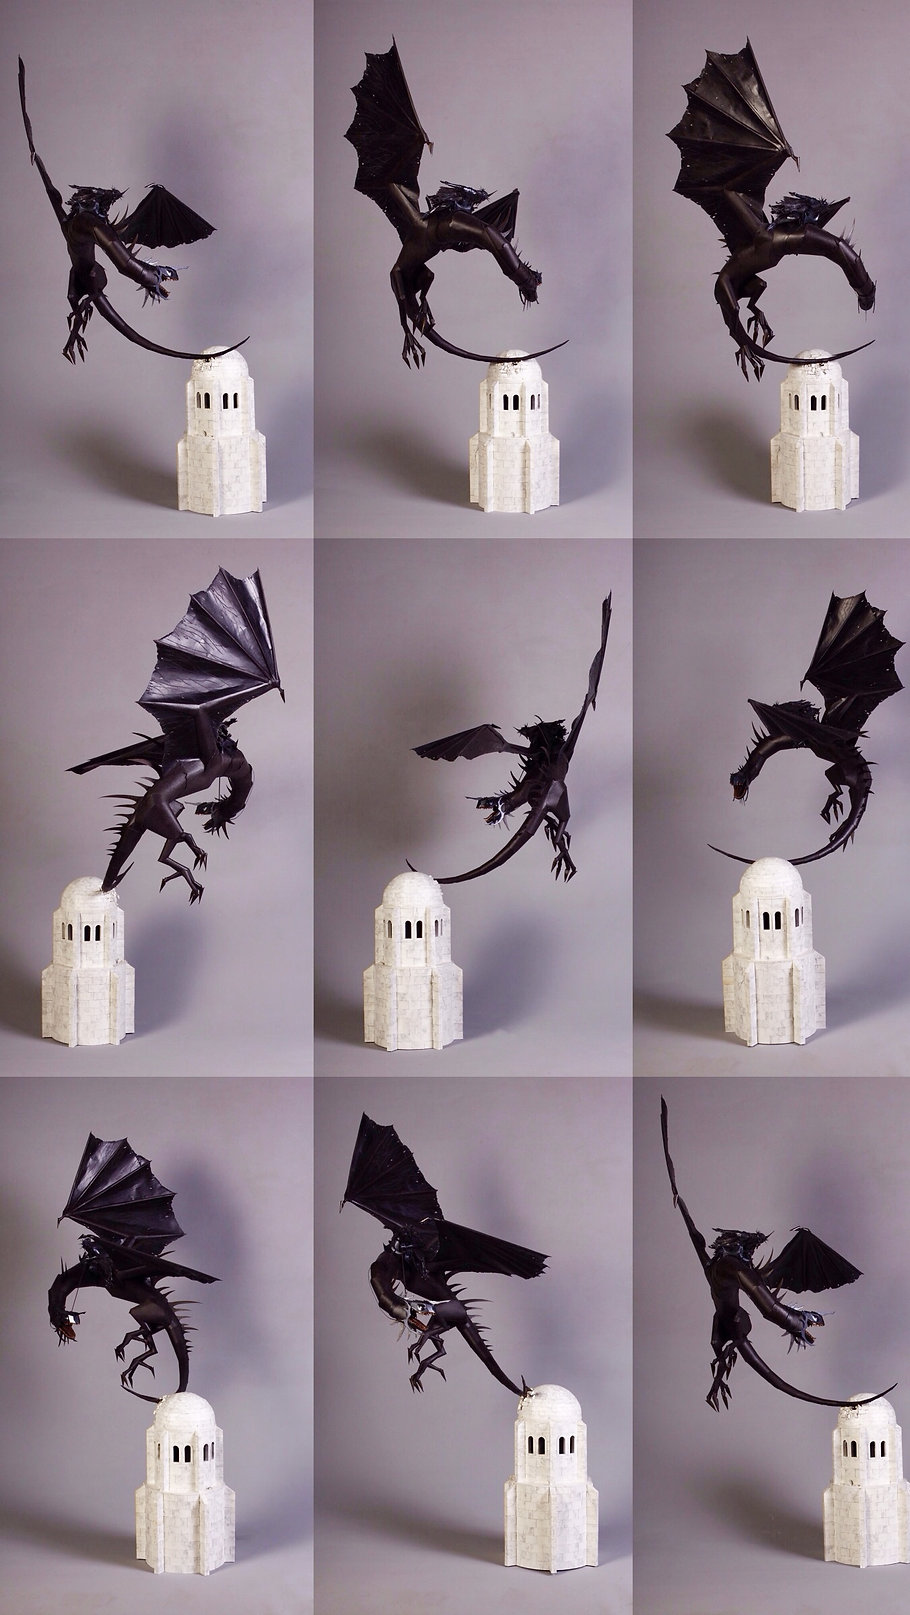 Atay_Gergin_Witch_King_Nazgul.JPG